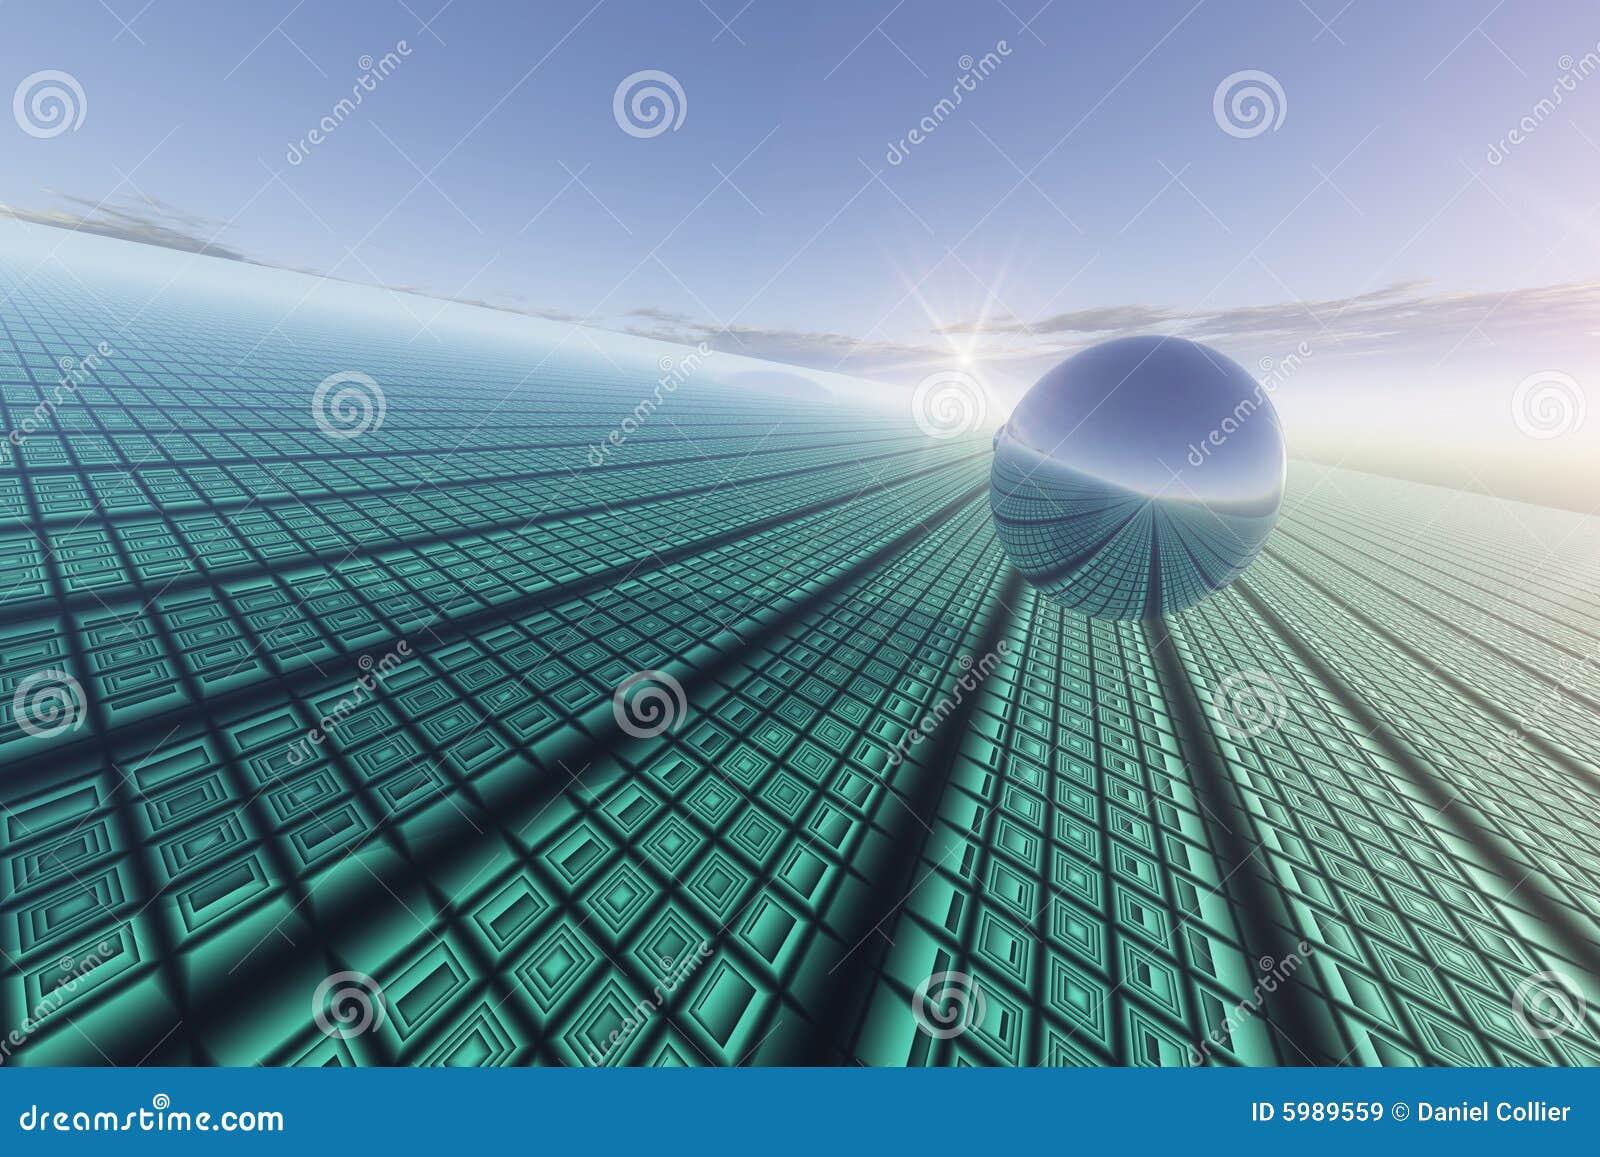 Grid Technology Background